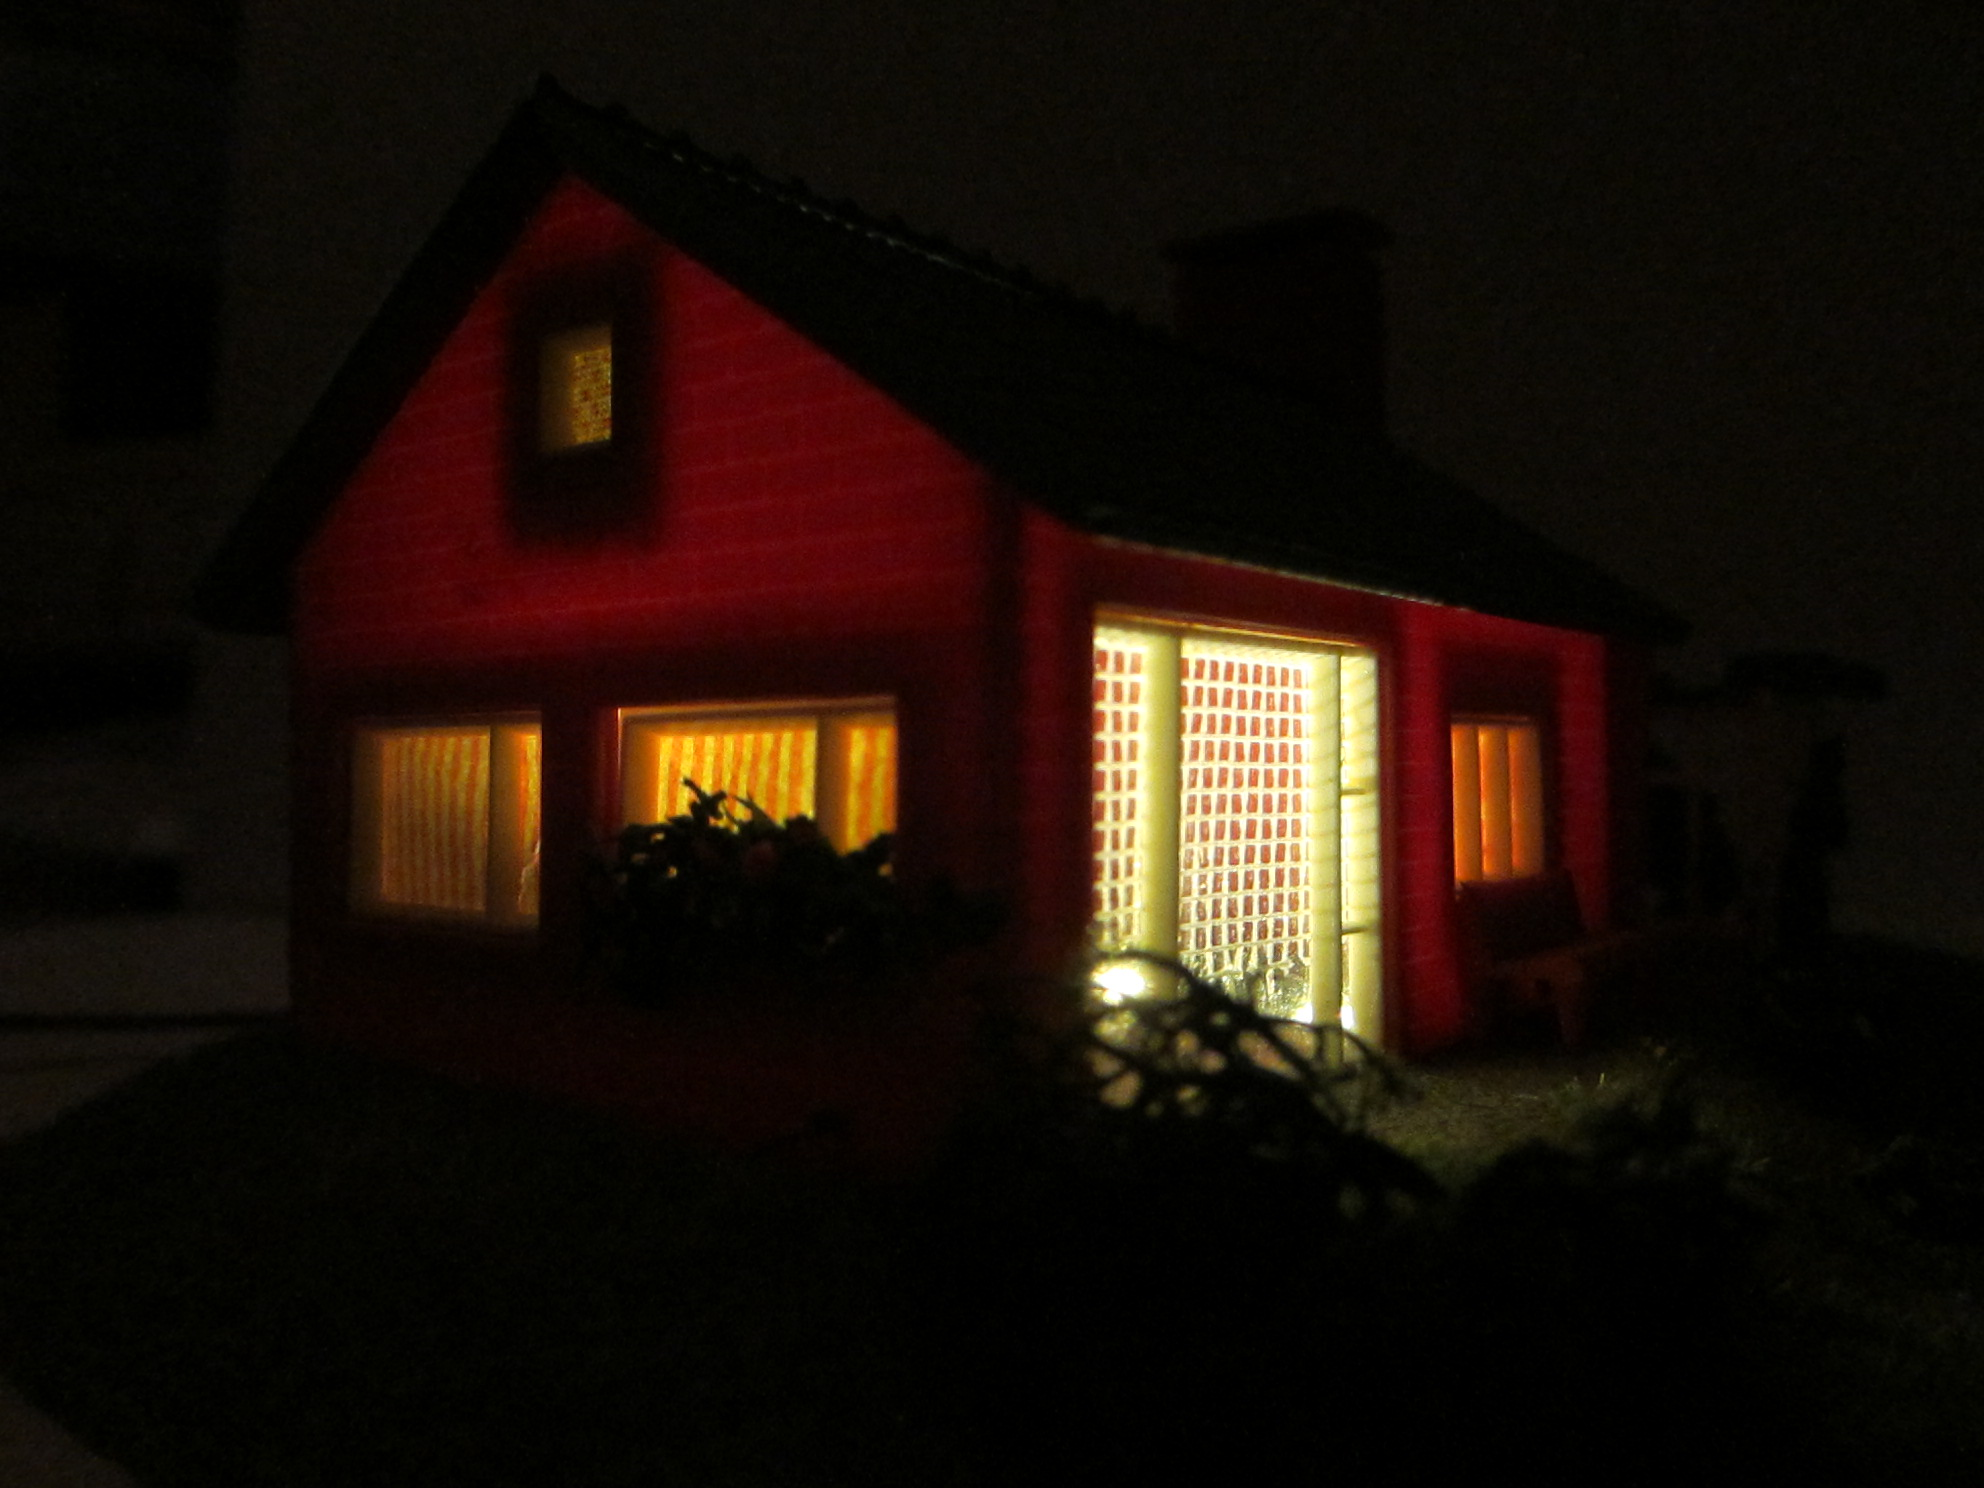 Hausbeleuchtung mit 1 x KELLTEC Universal / Häuserbeleuchtungen warmweiss